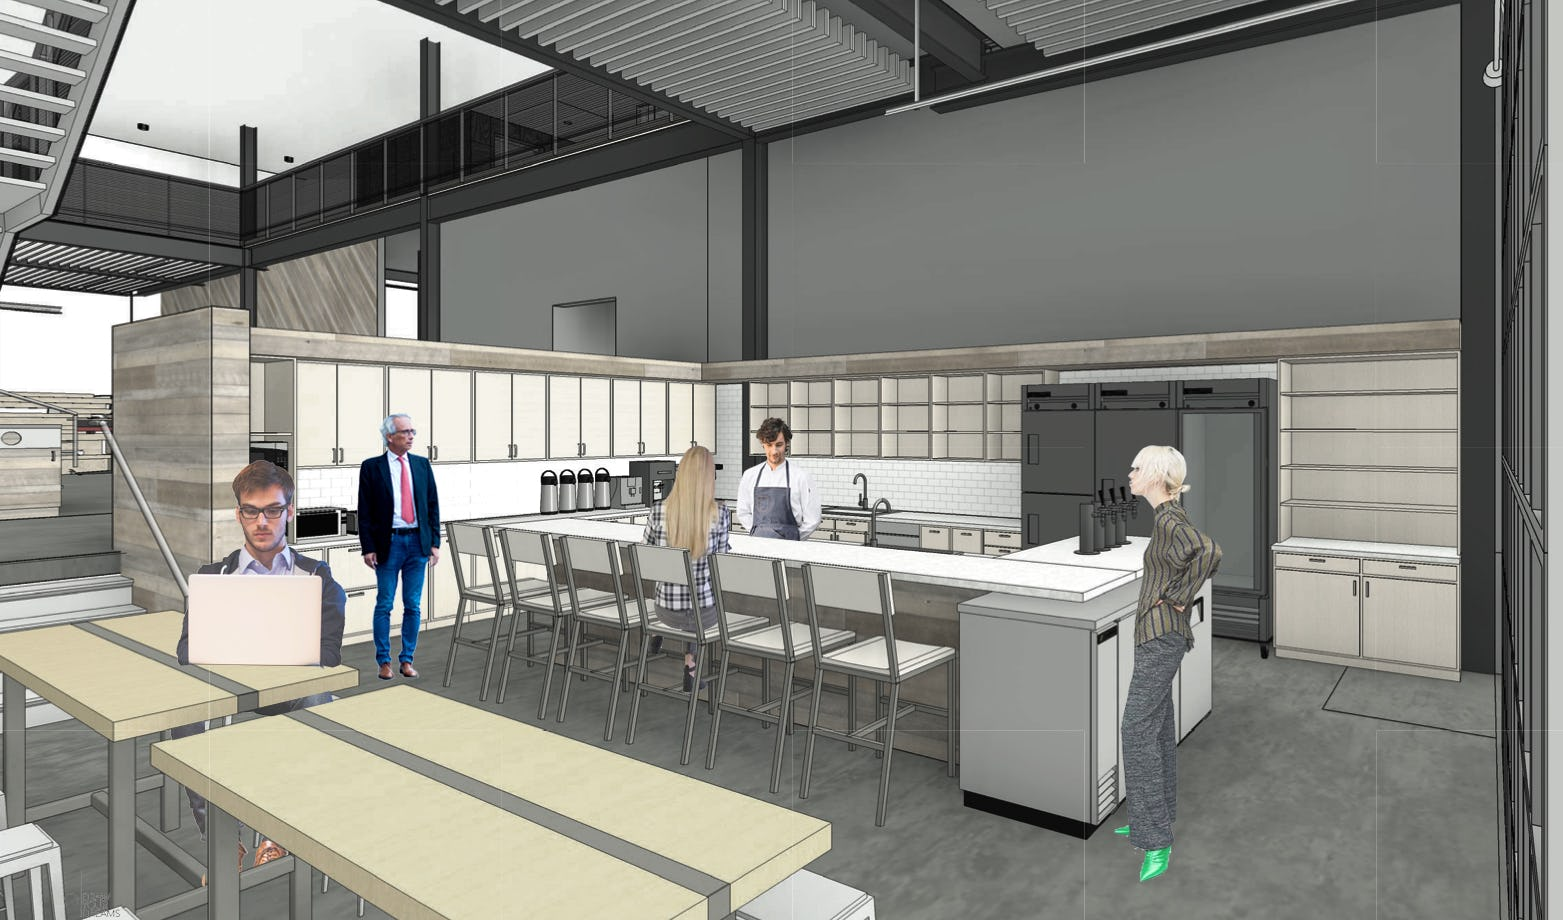 Madave kitchen urm portland adaptive reuse